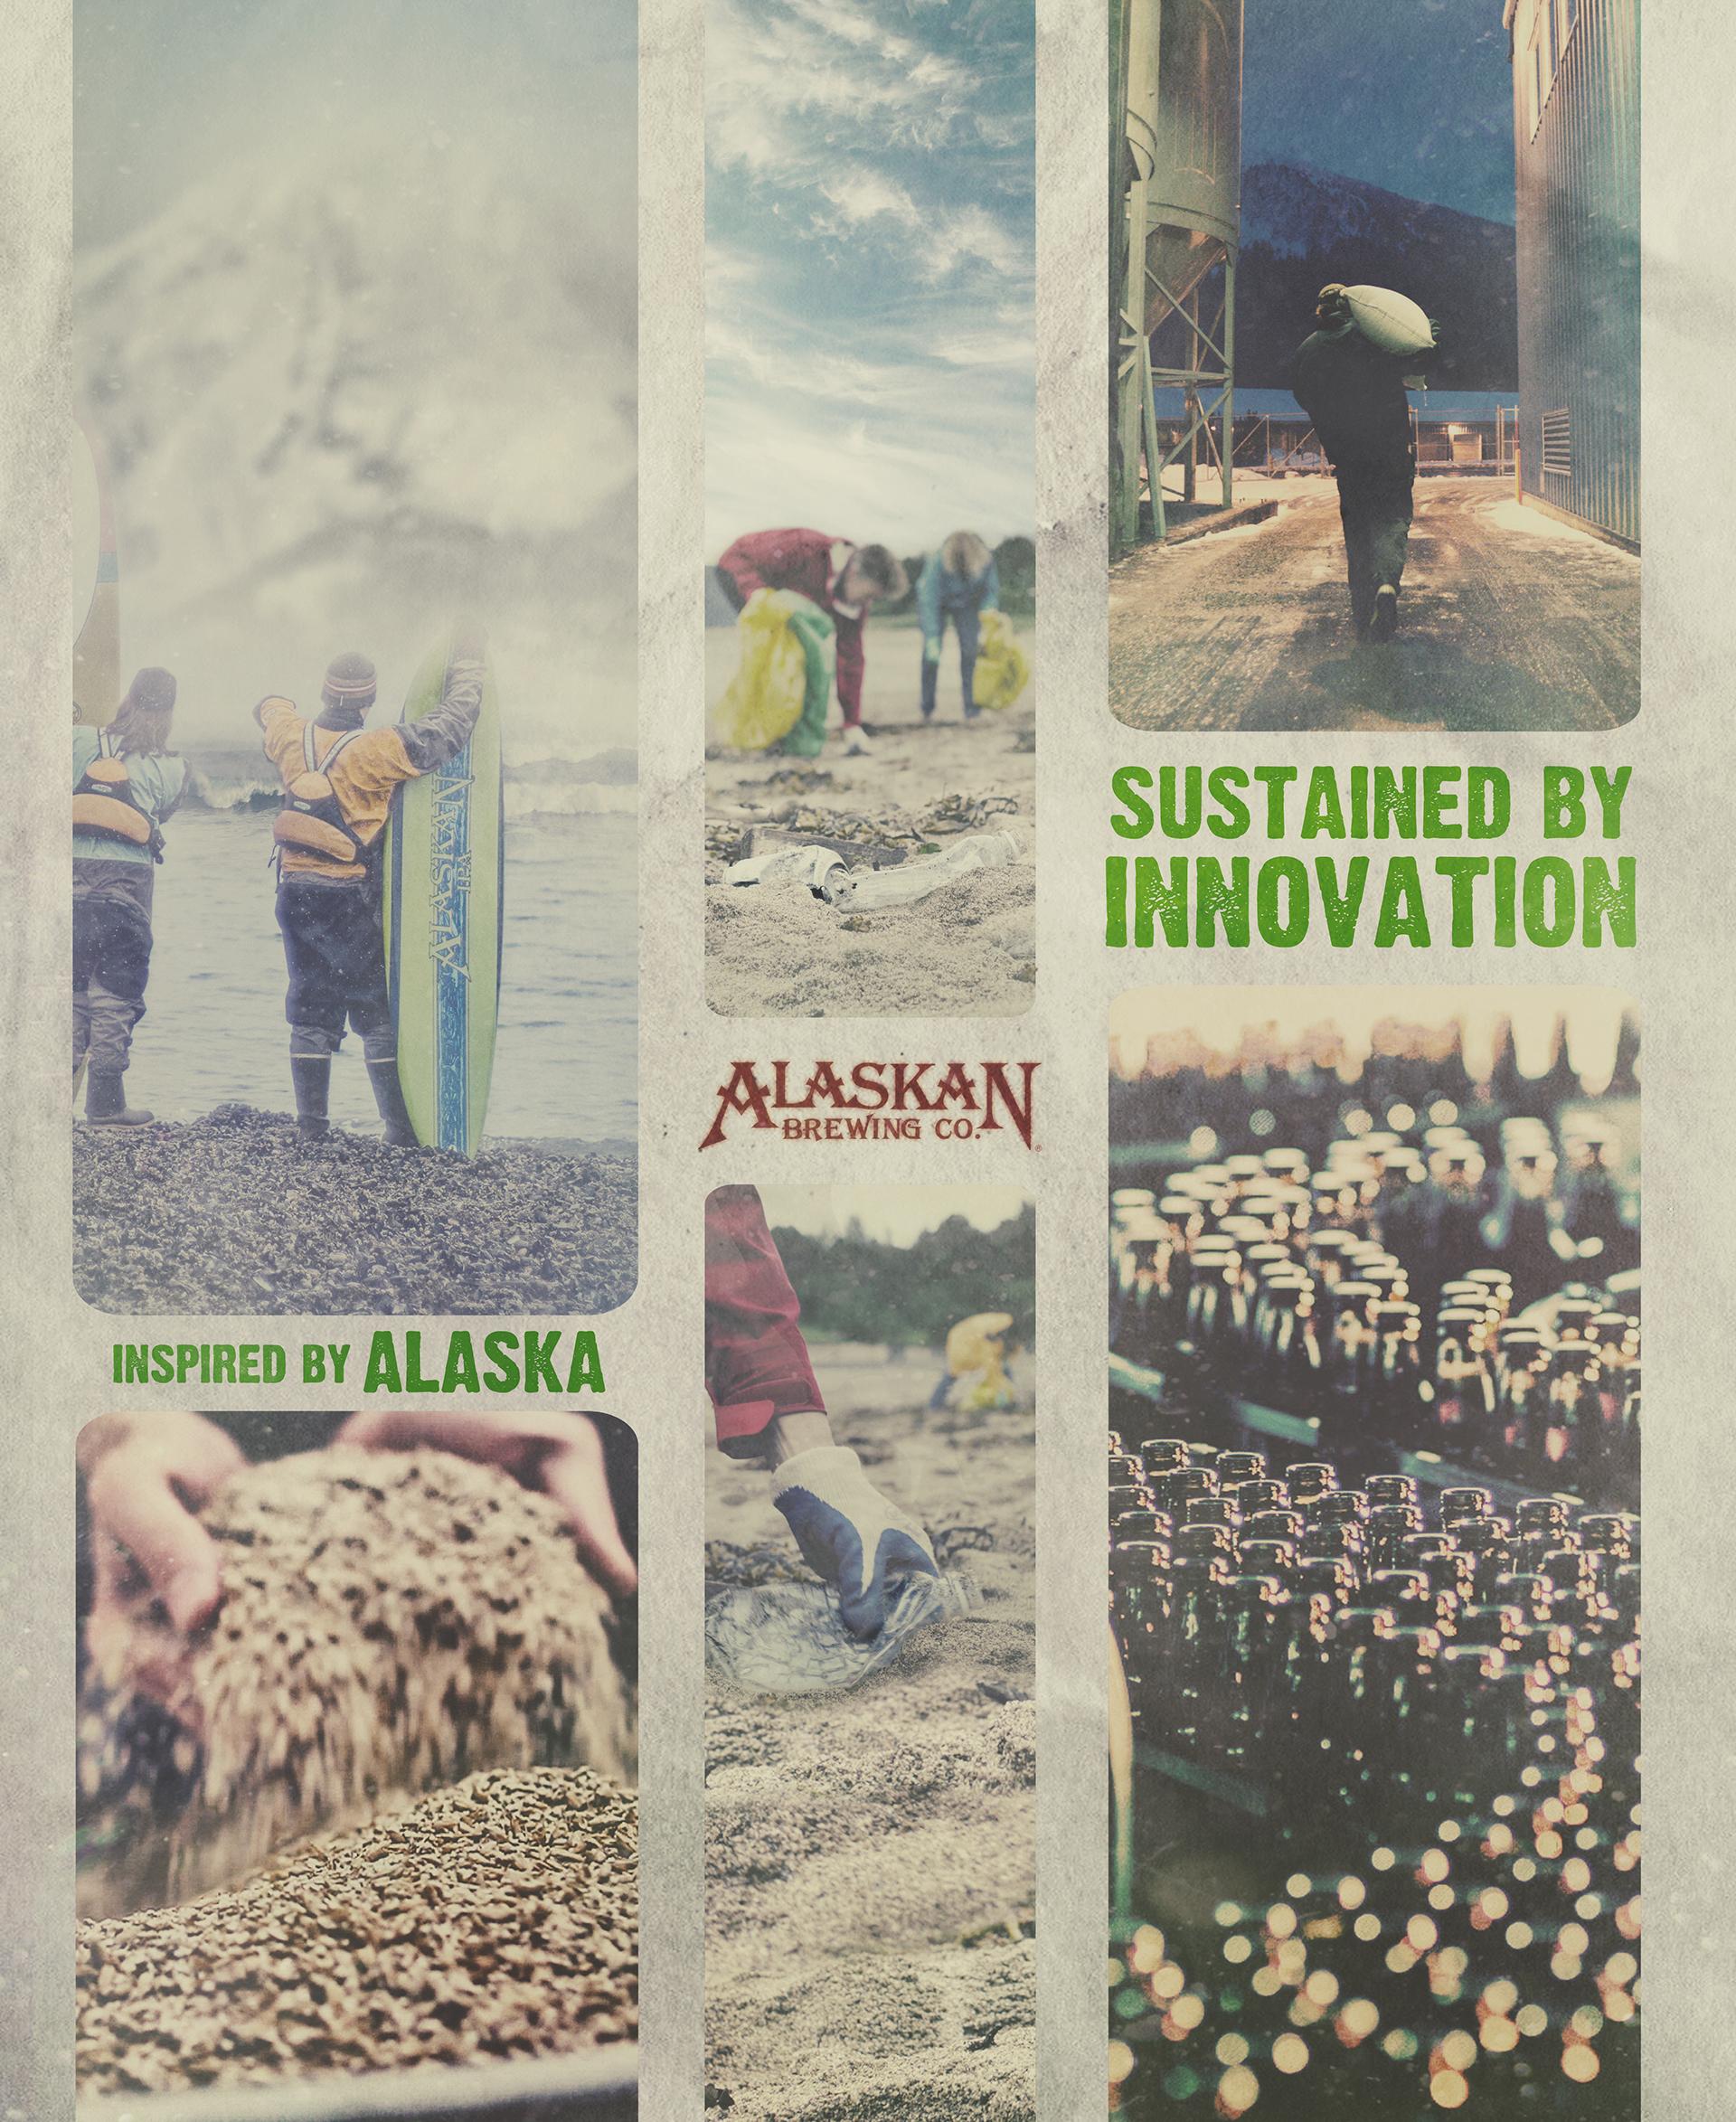 Redtail-AlaskanBC-Ads-006.jpg